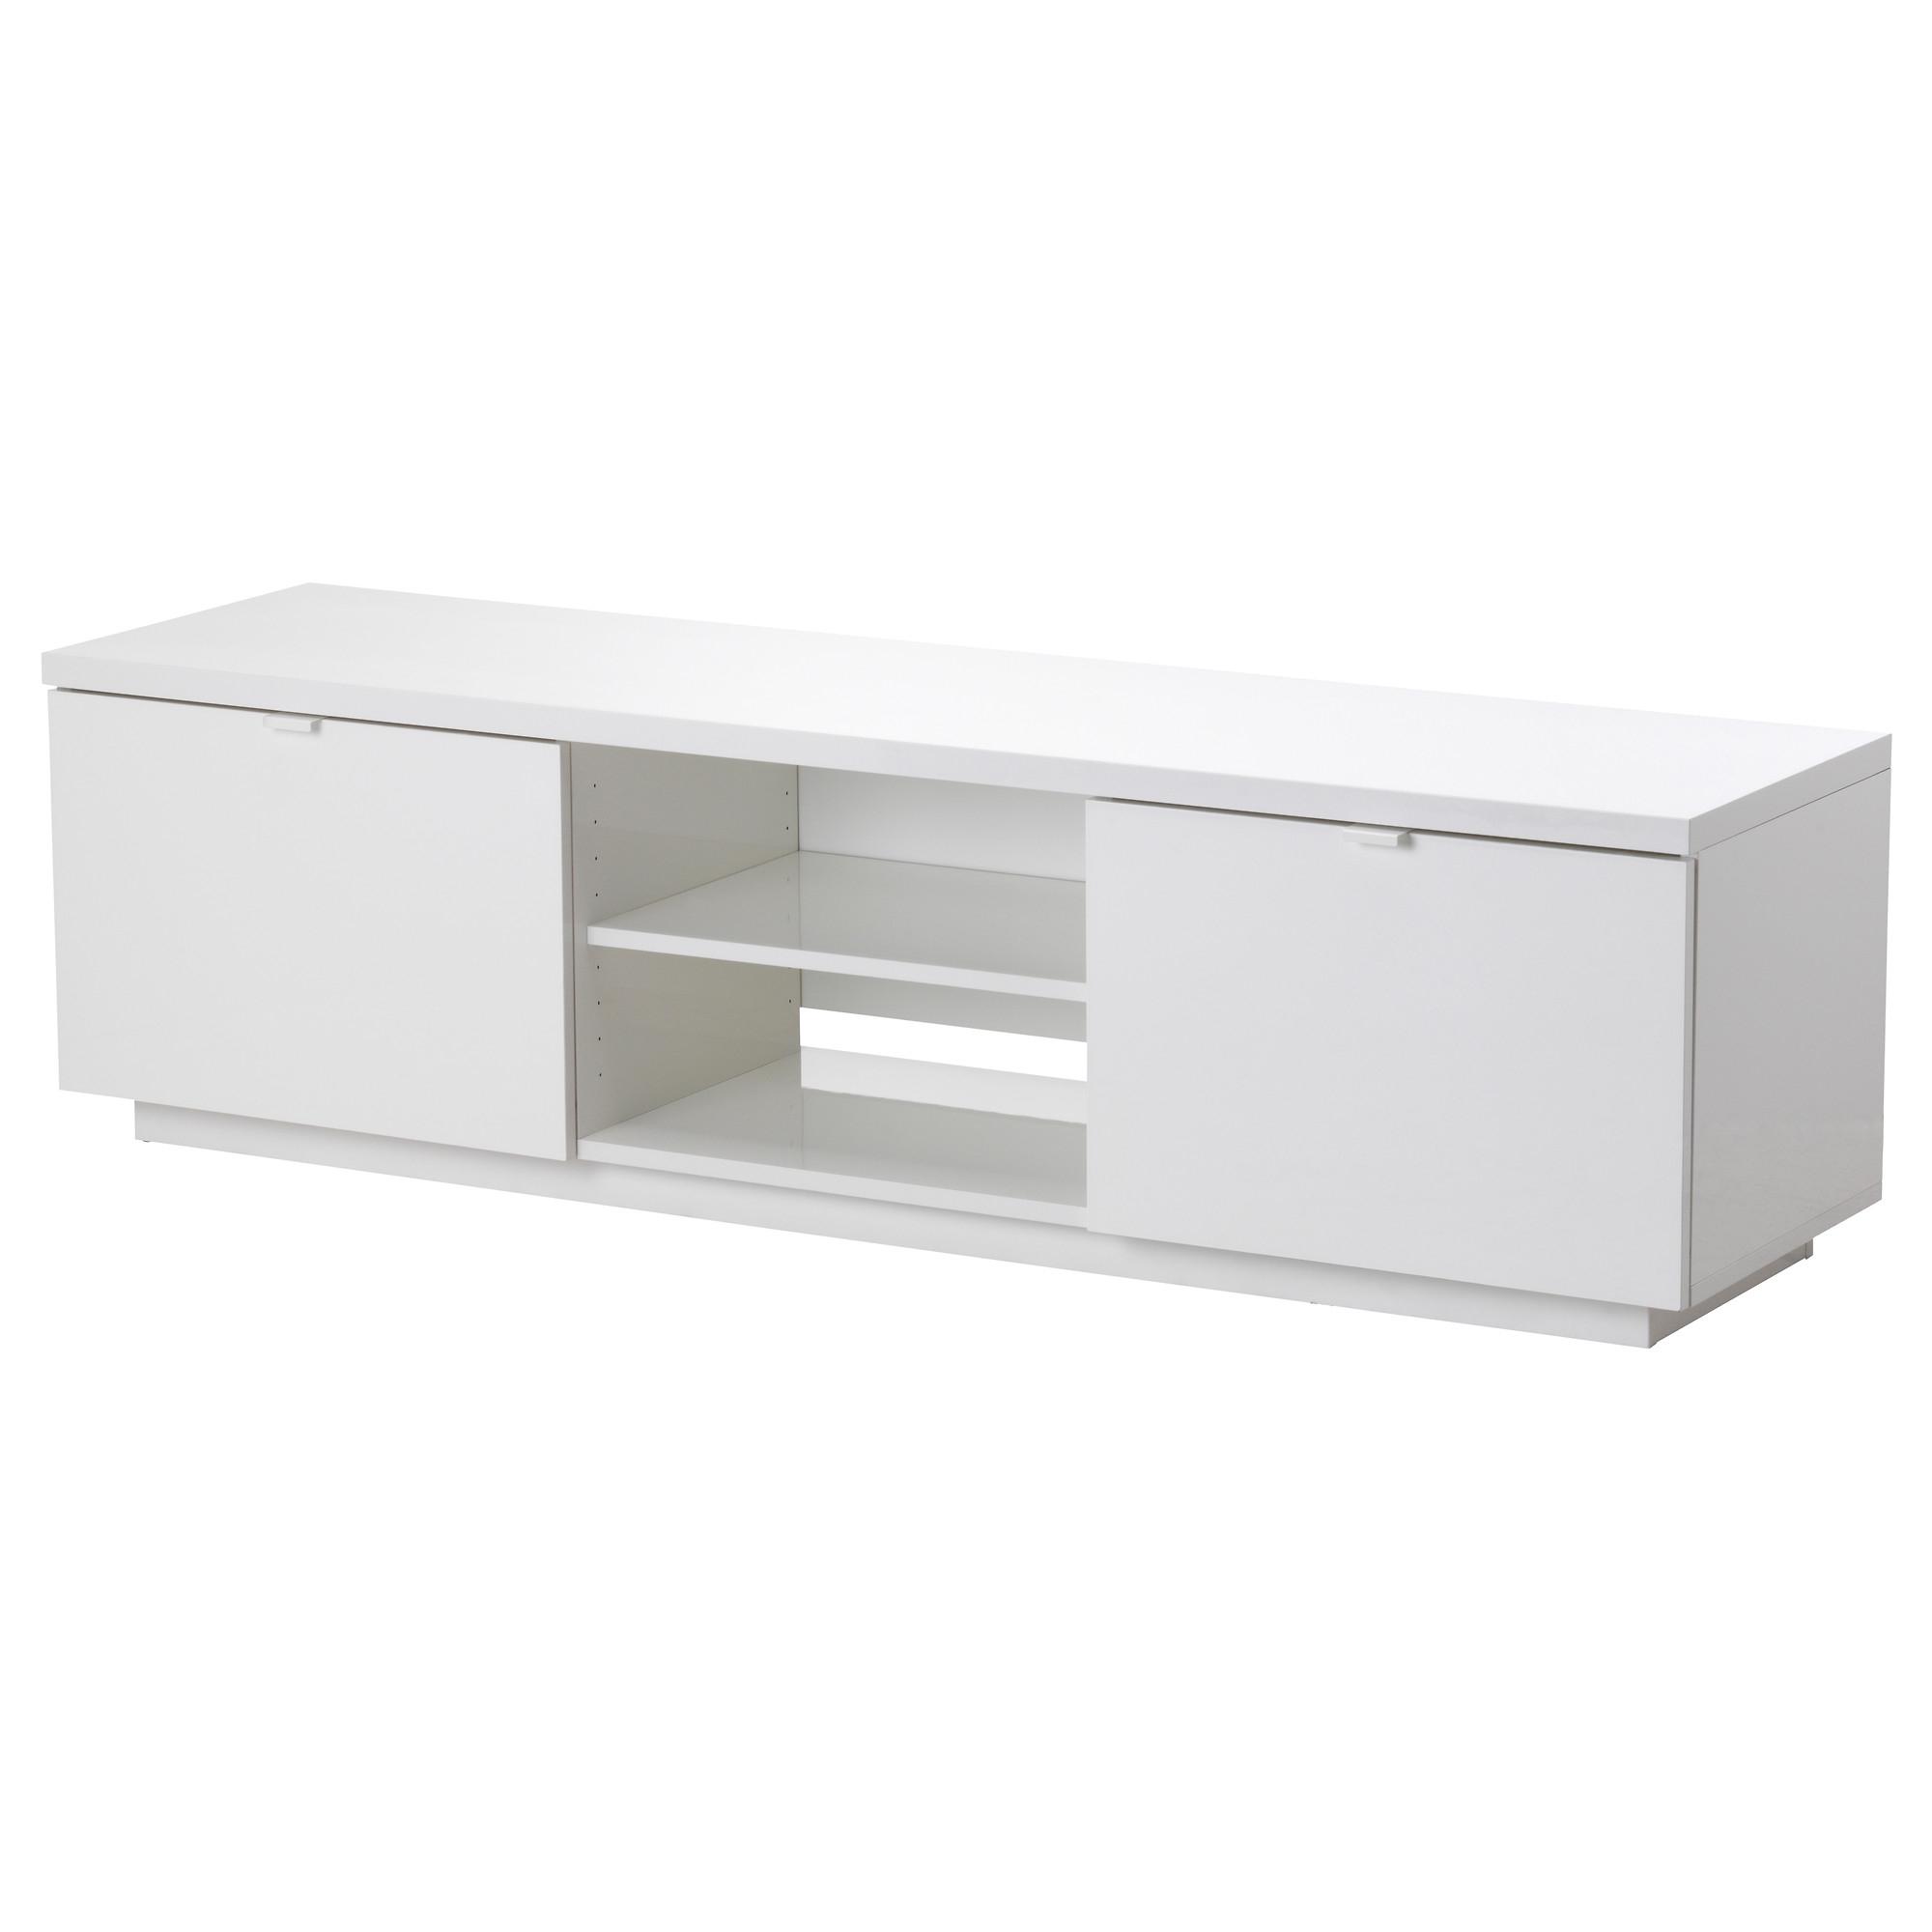 Mesa Auxiliar Cama Ikea. Bys Banco Para Tv Sqo Rd Rd With Mesa ...